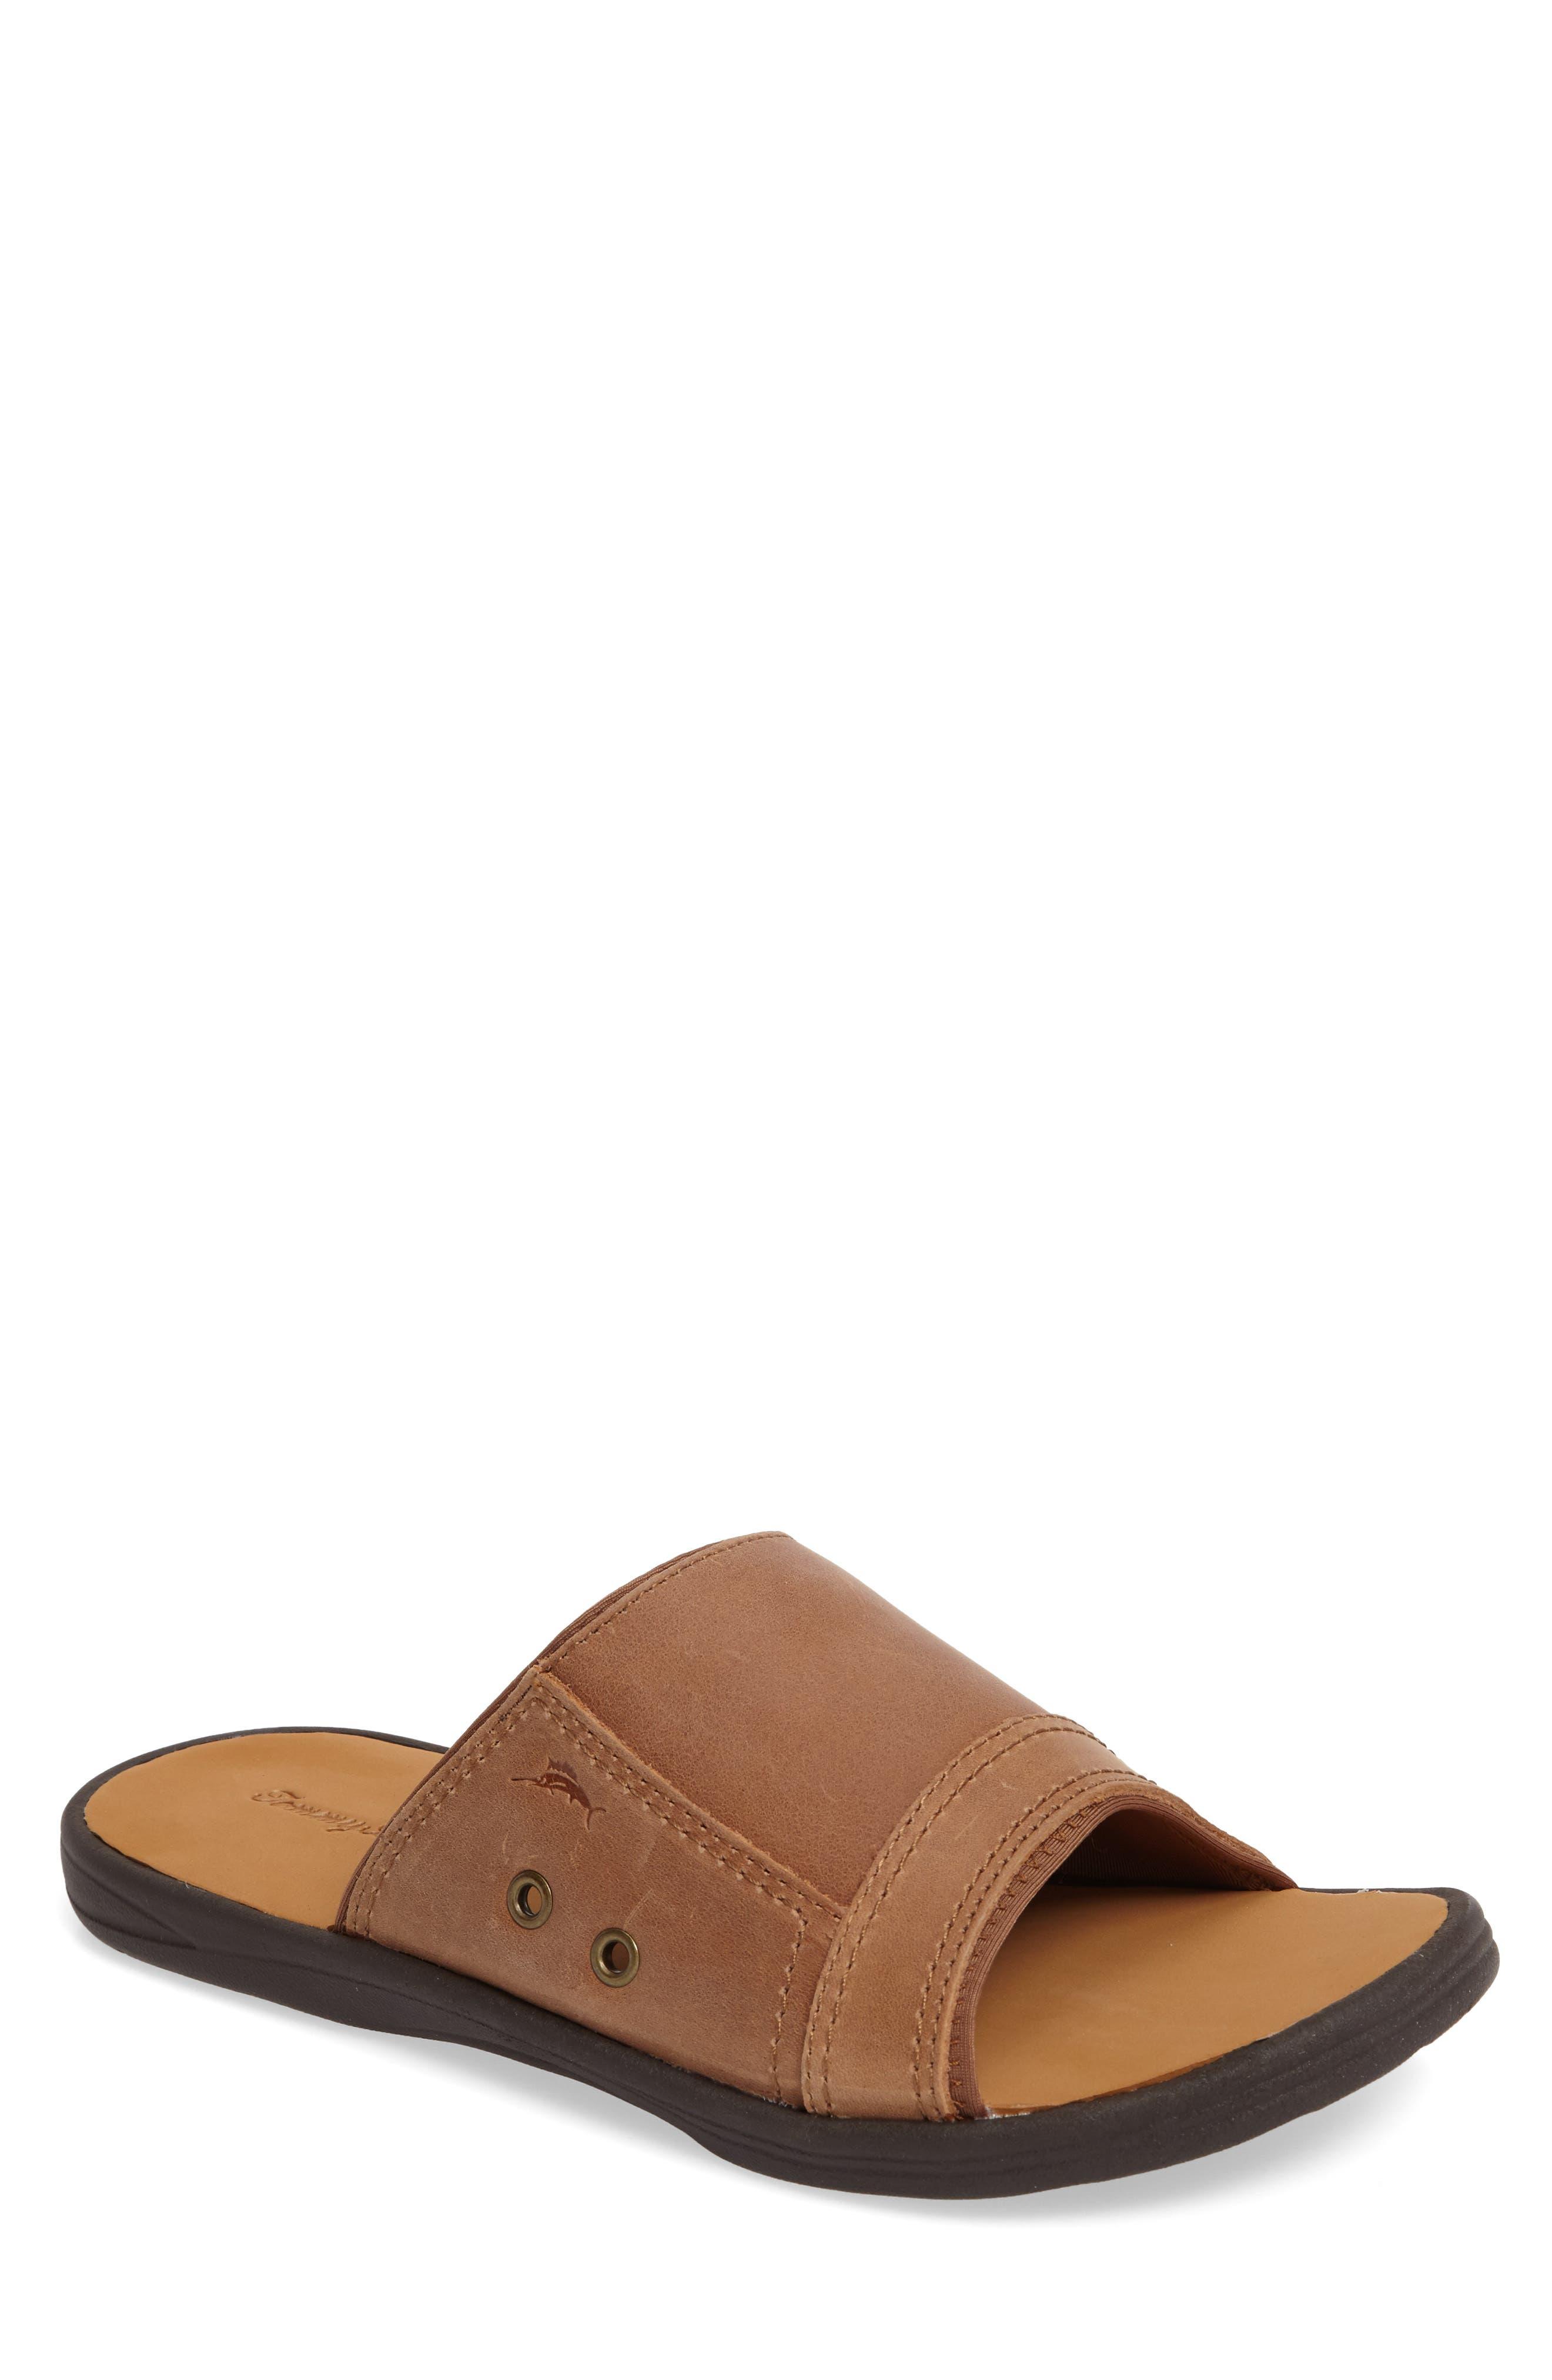 TOMMY BAHAMA Seawell Slide Sandal